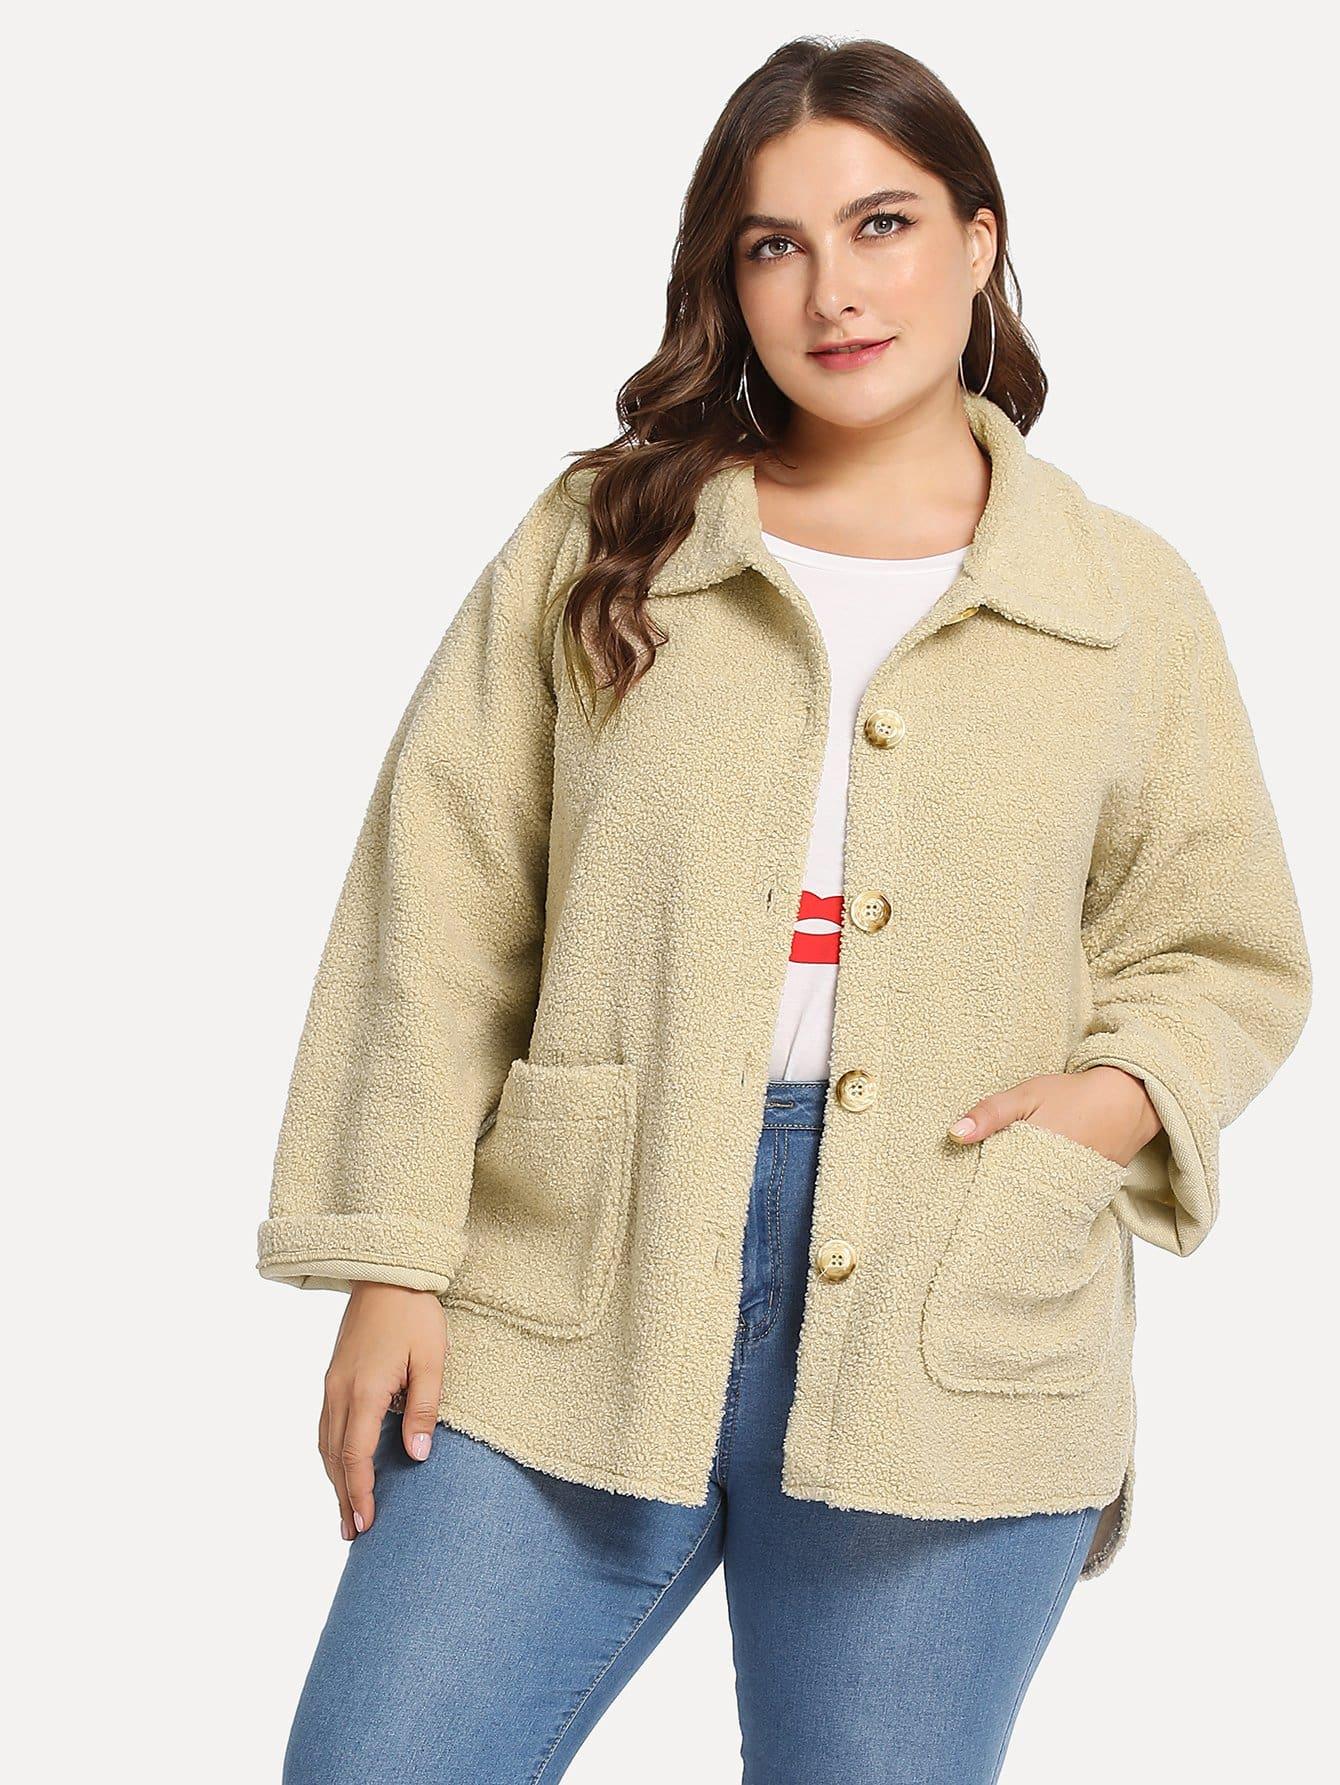 Фото - Большое пальто тедди с двумя кармана от SheIn цвета хаки